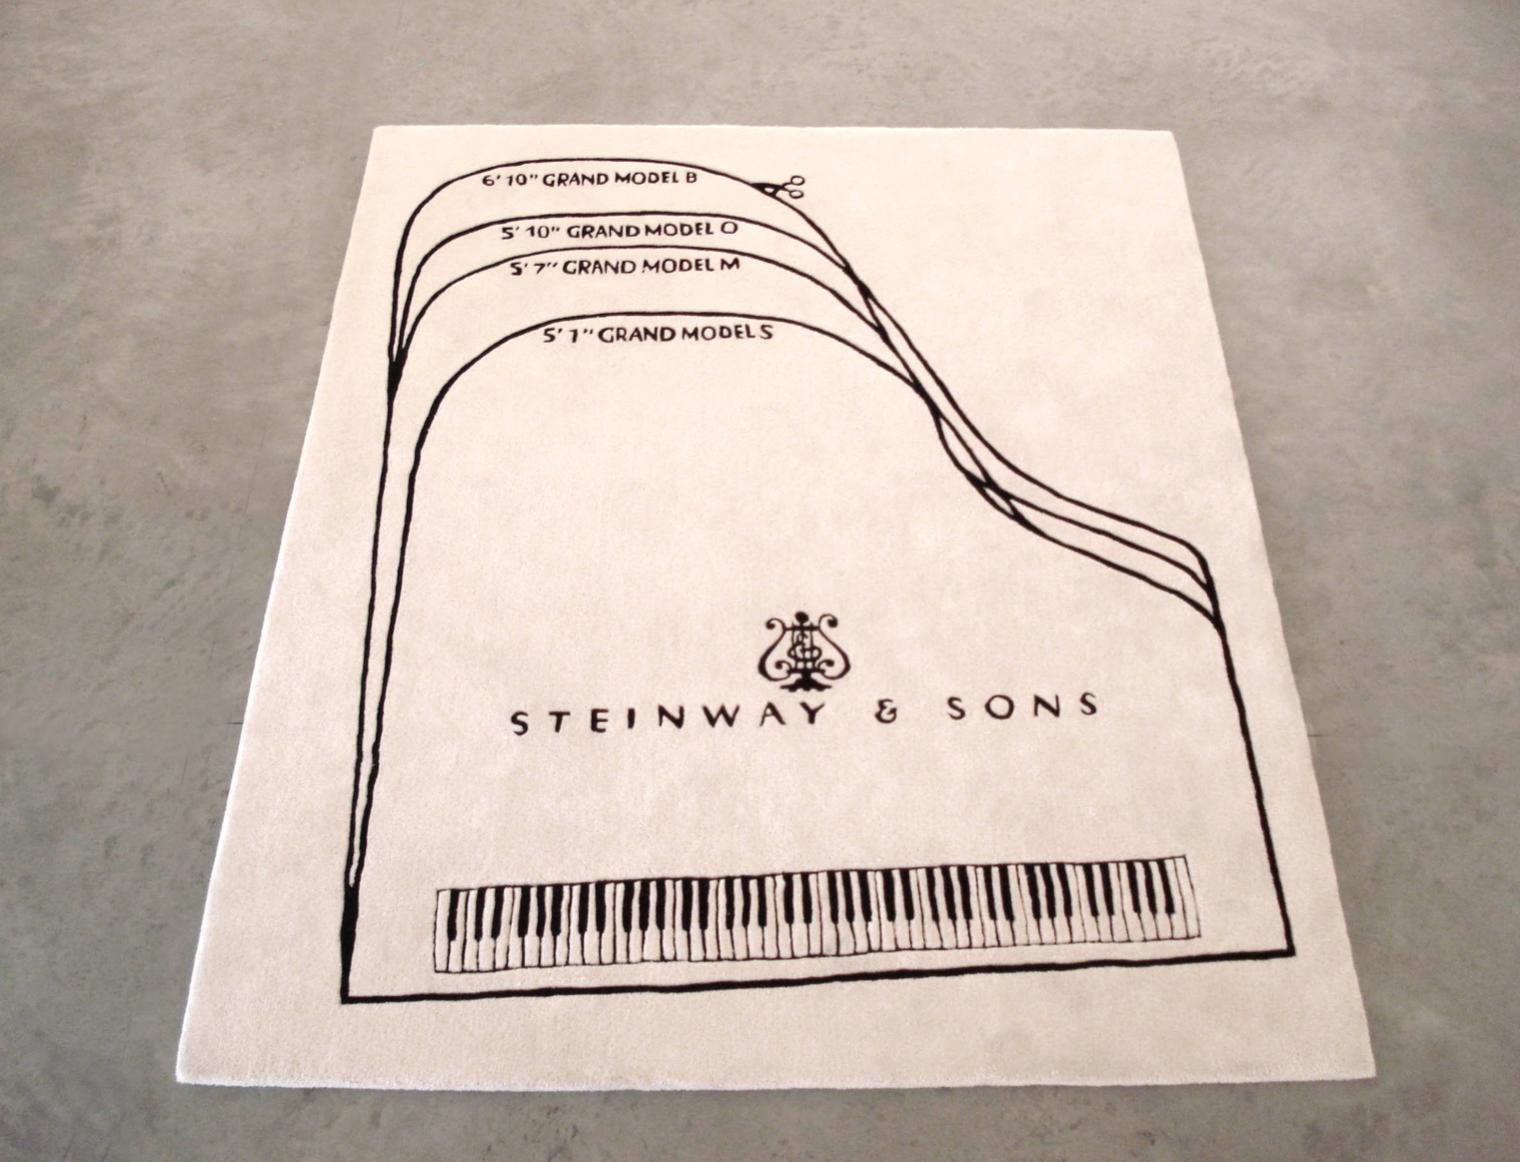 Barbara Bloom,  Steinway Piano Carpet  (2010). Courtesy of David Lewis Gallery, New York.